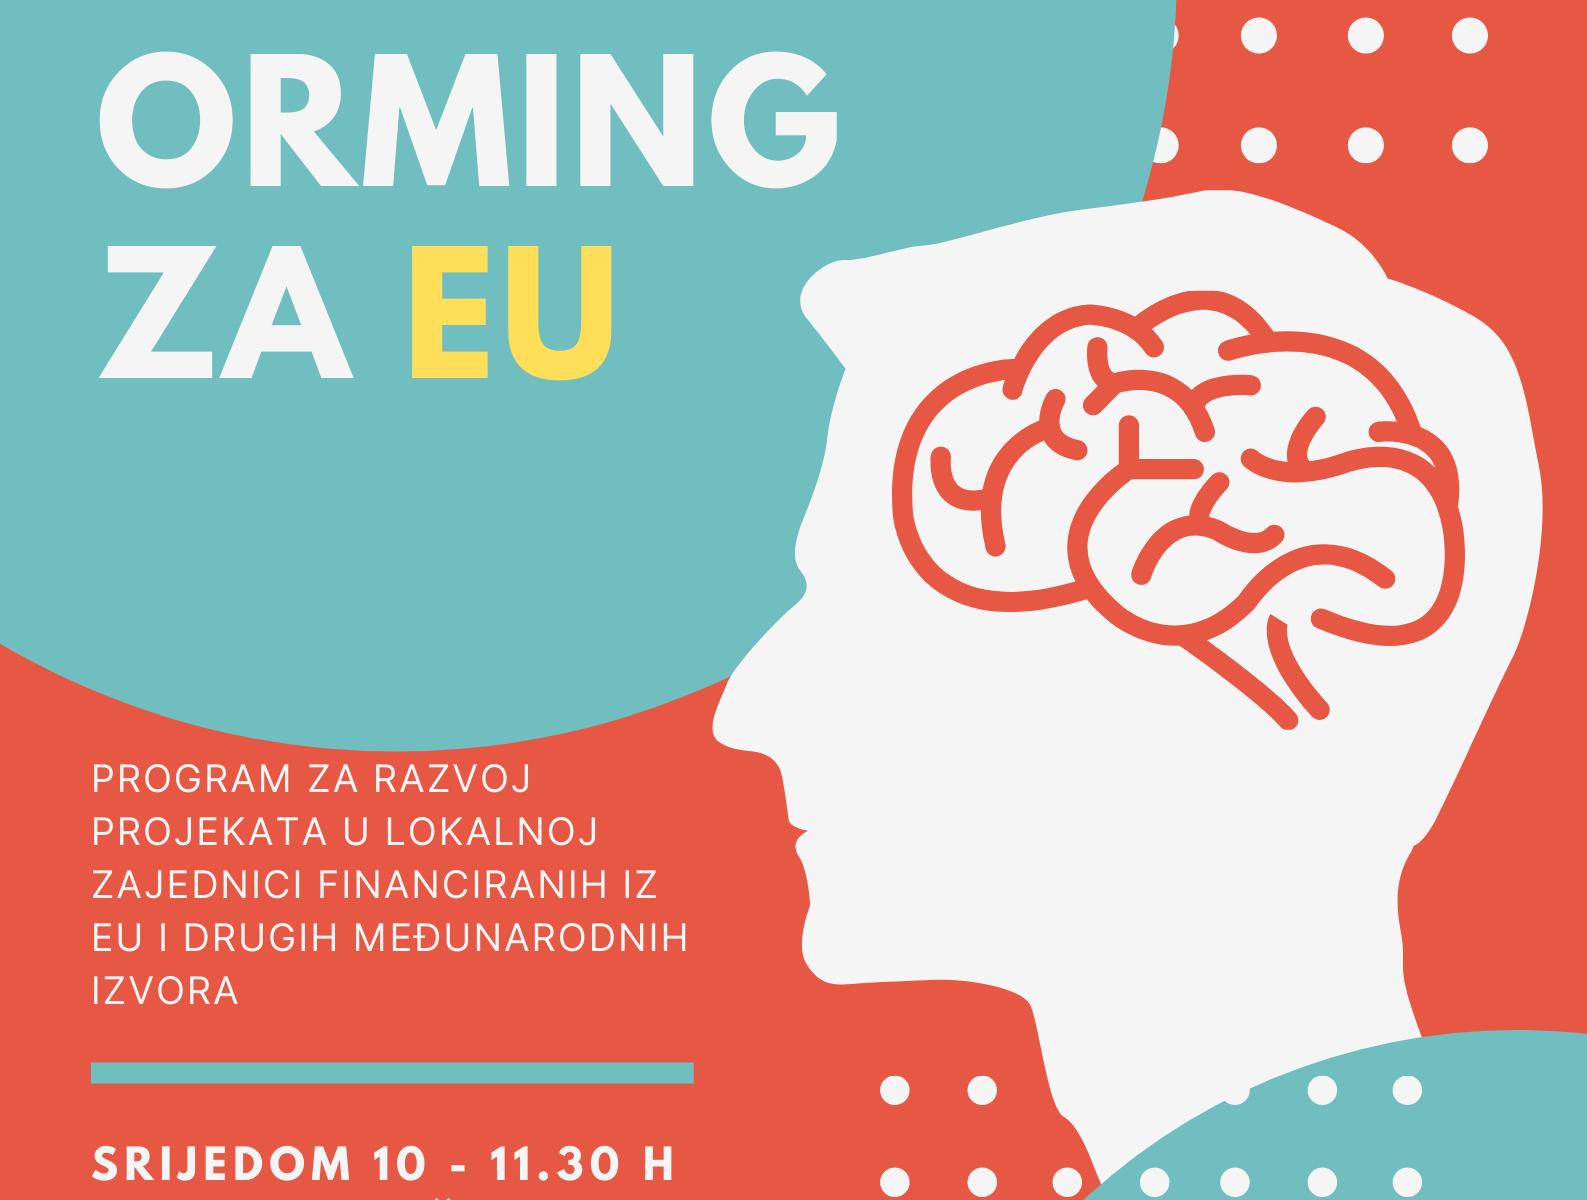 Brainstorming za EU: partnerski program CeKaTe za razvoj projekata financiranih iz EU